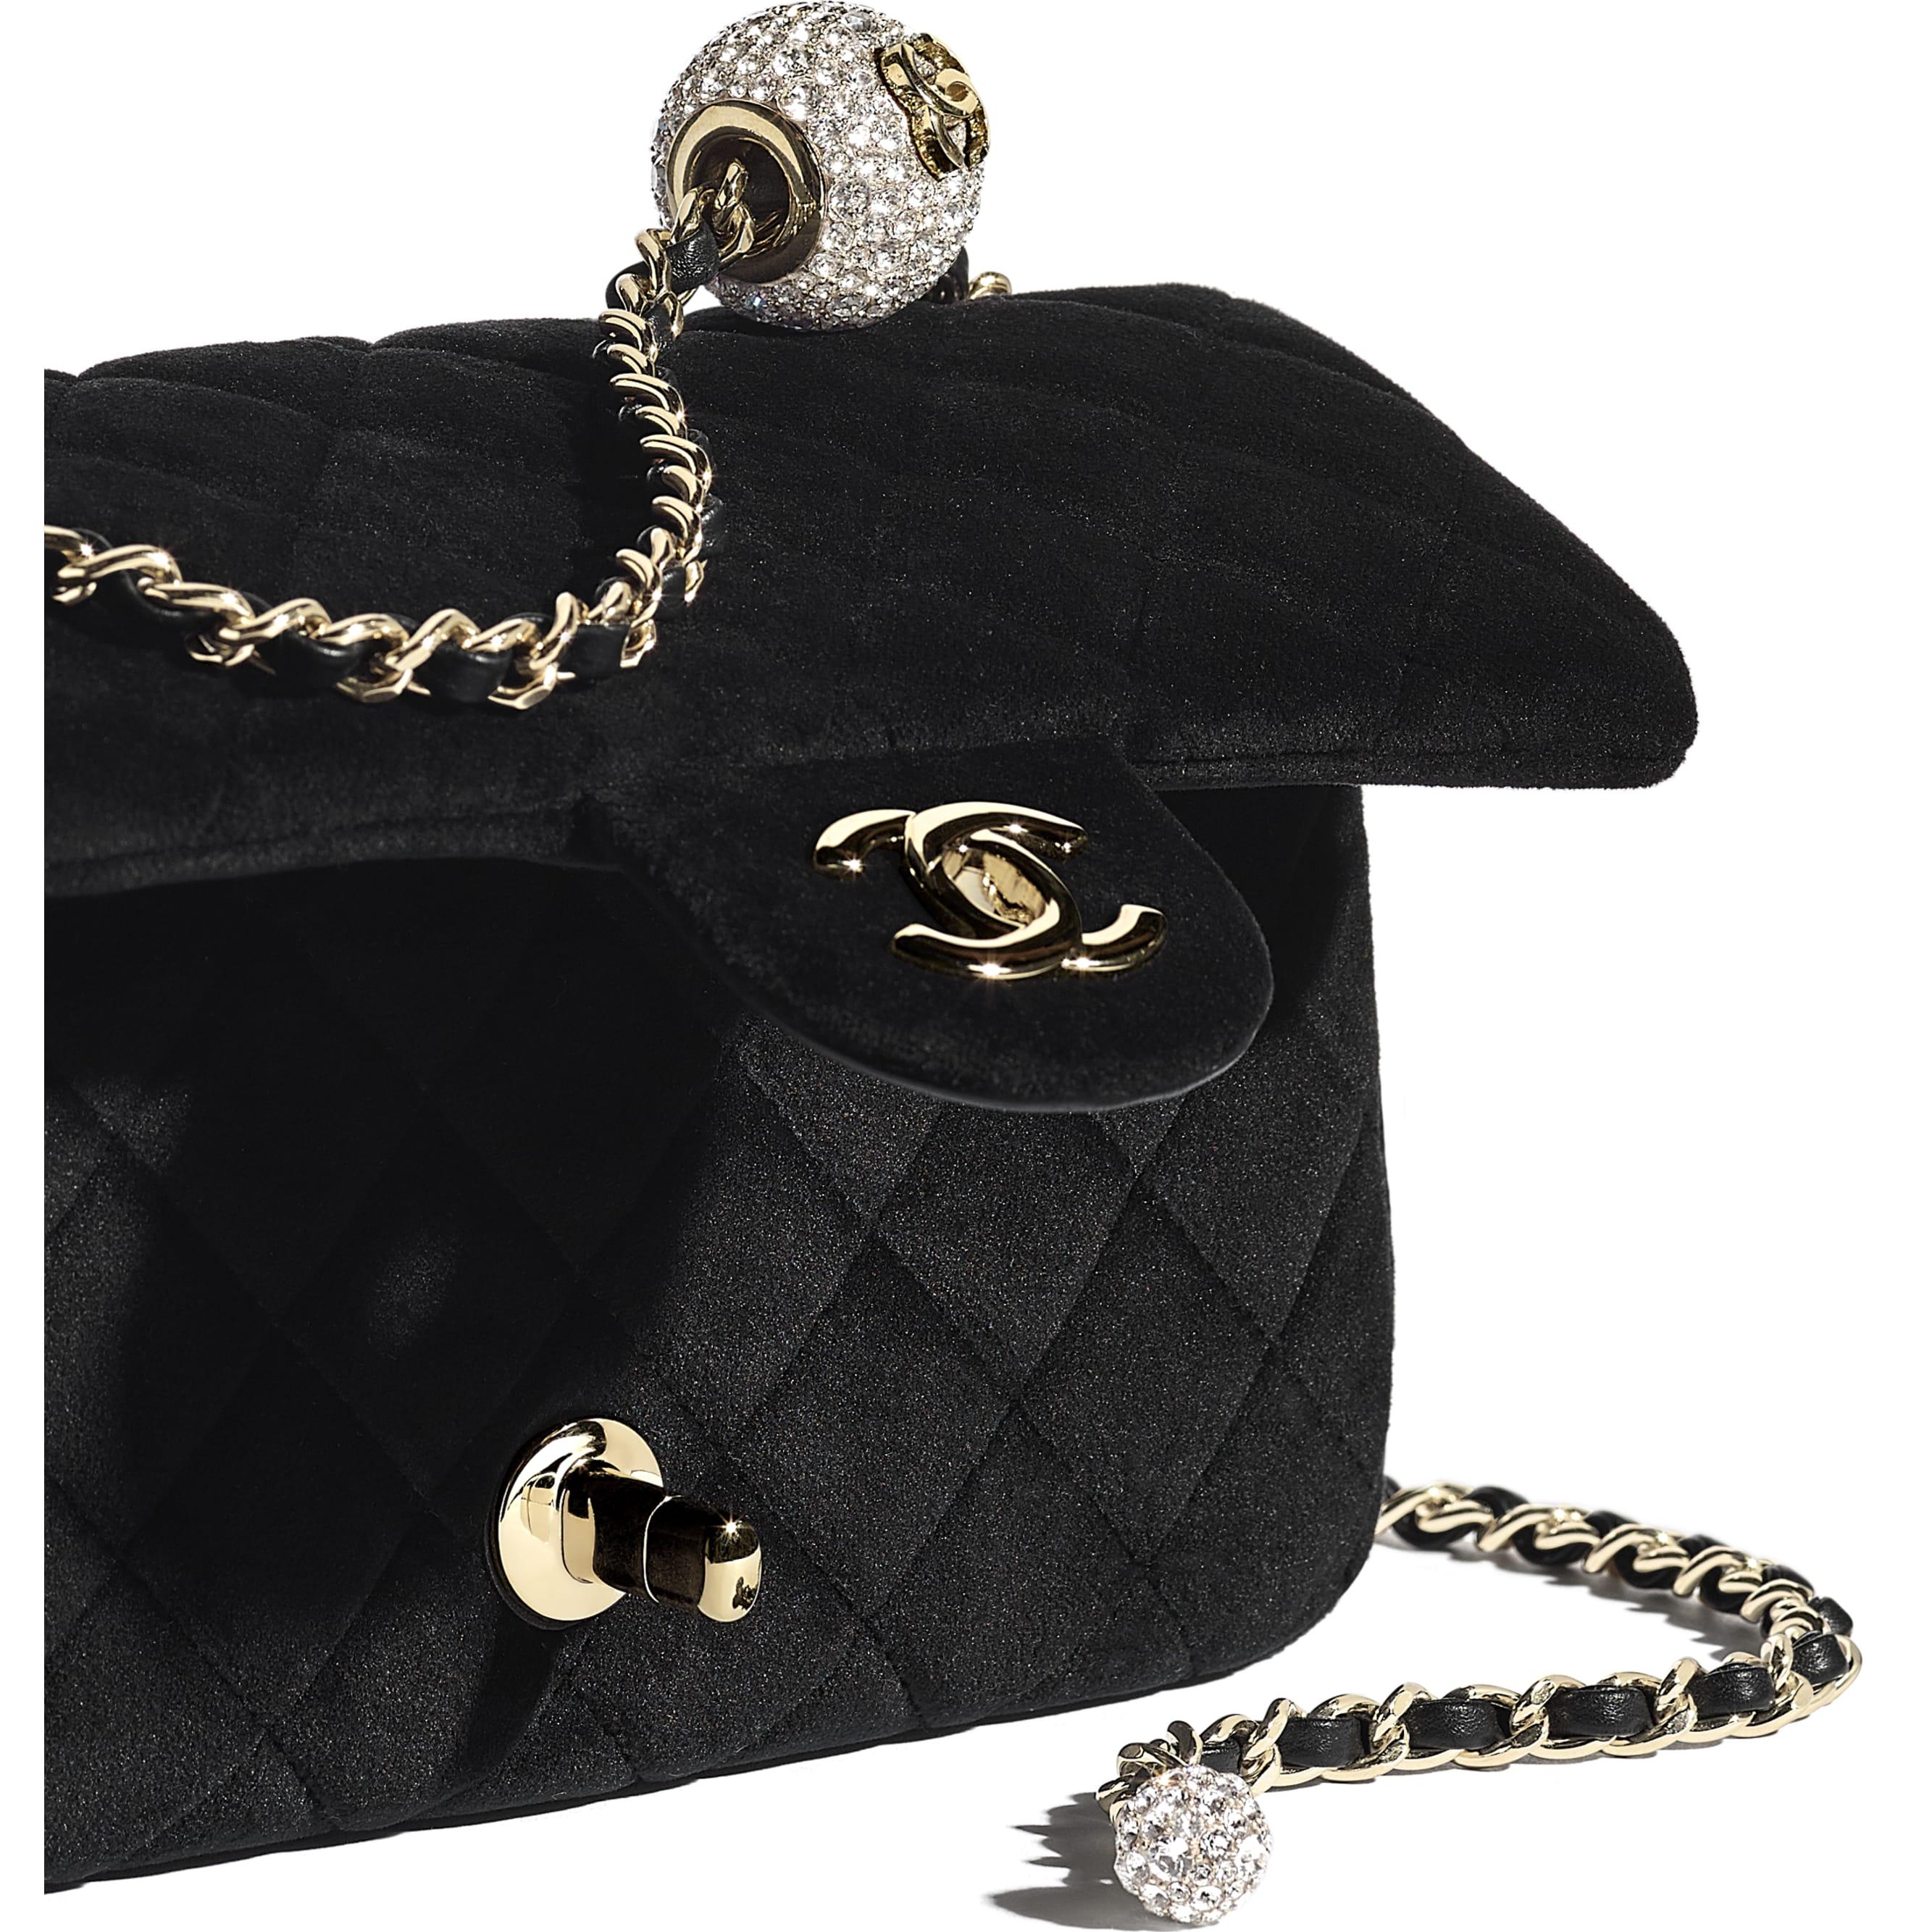 Flap Bag - Black - Velvet, Diamanté & Silver-Tone Metal - CHANEL - Extra view - see standard sized version